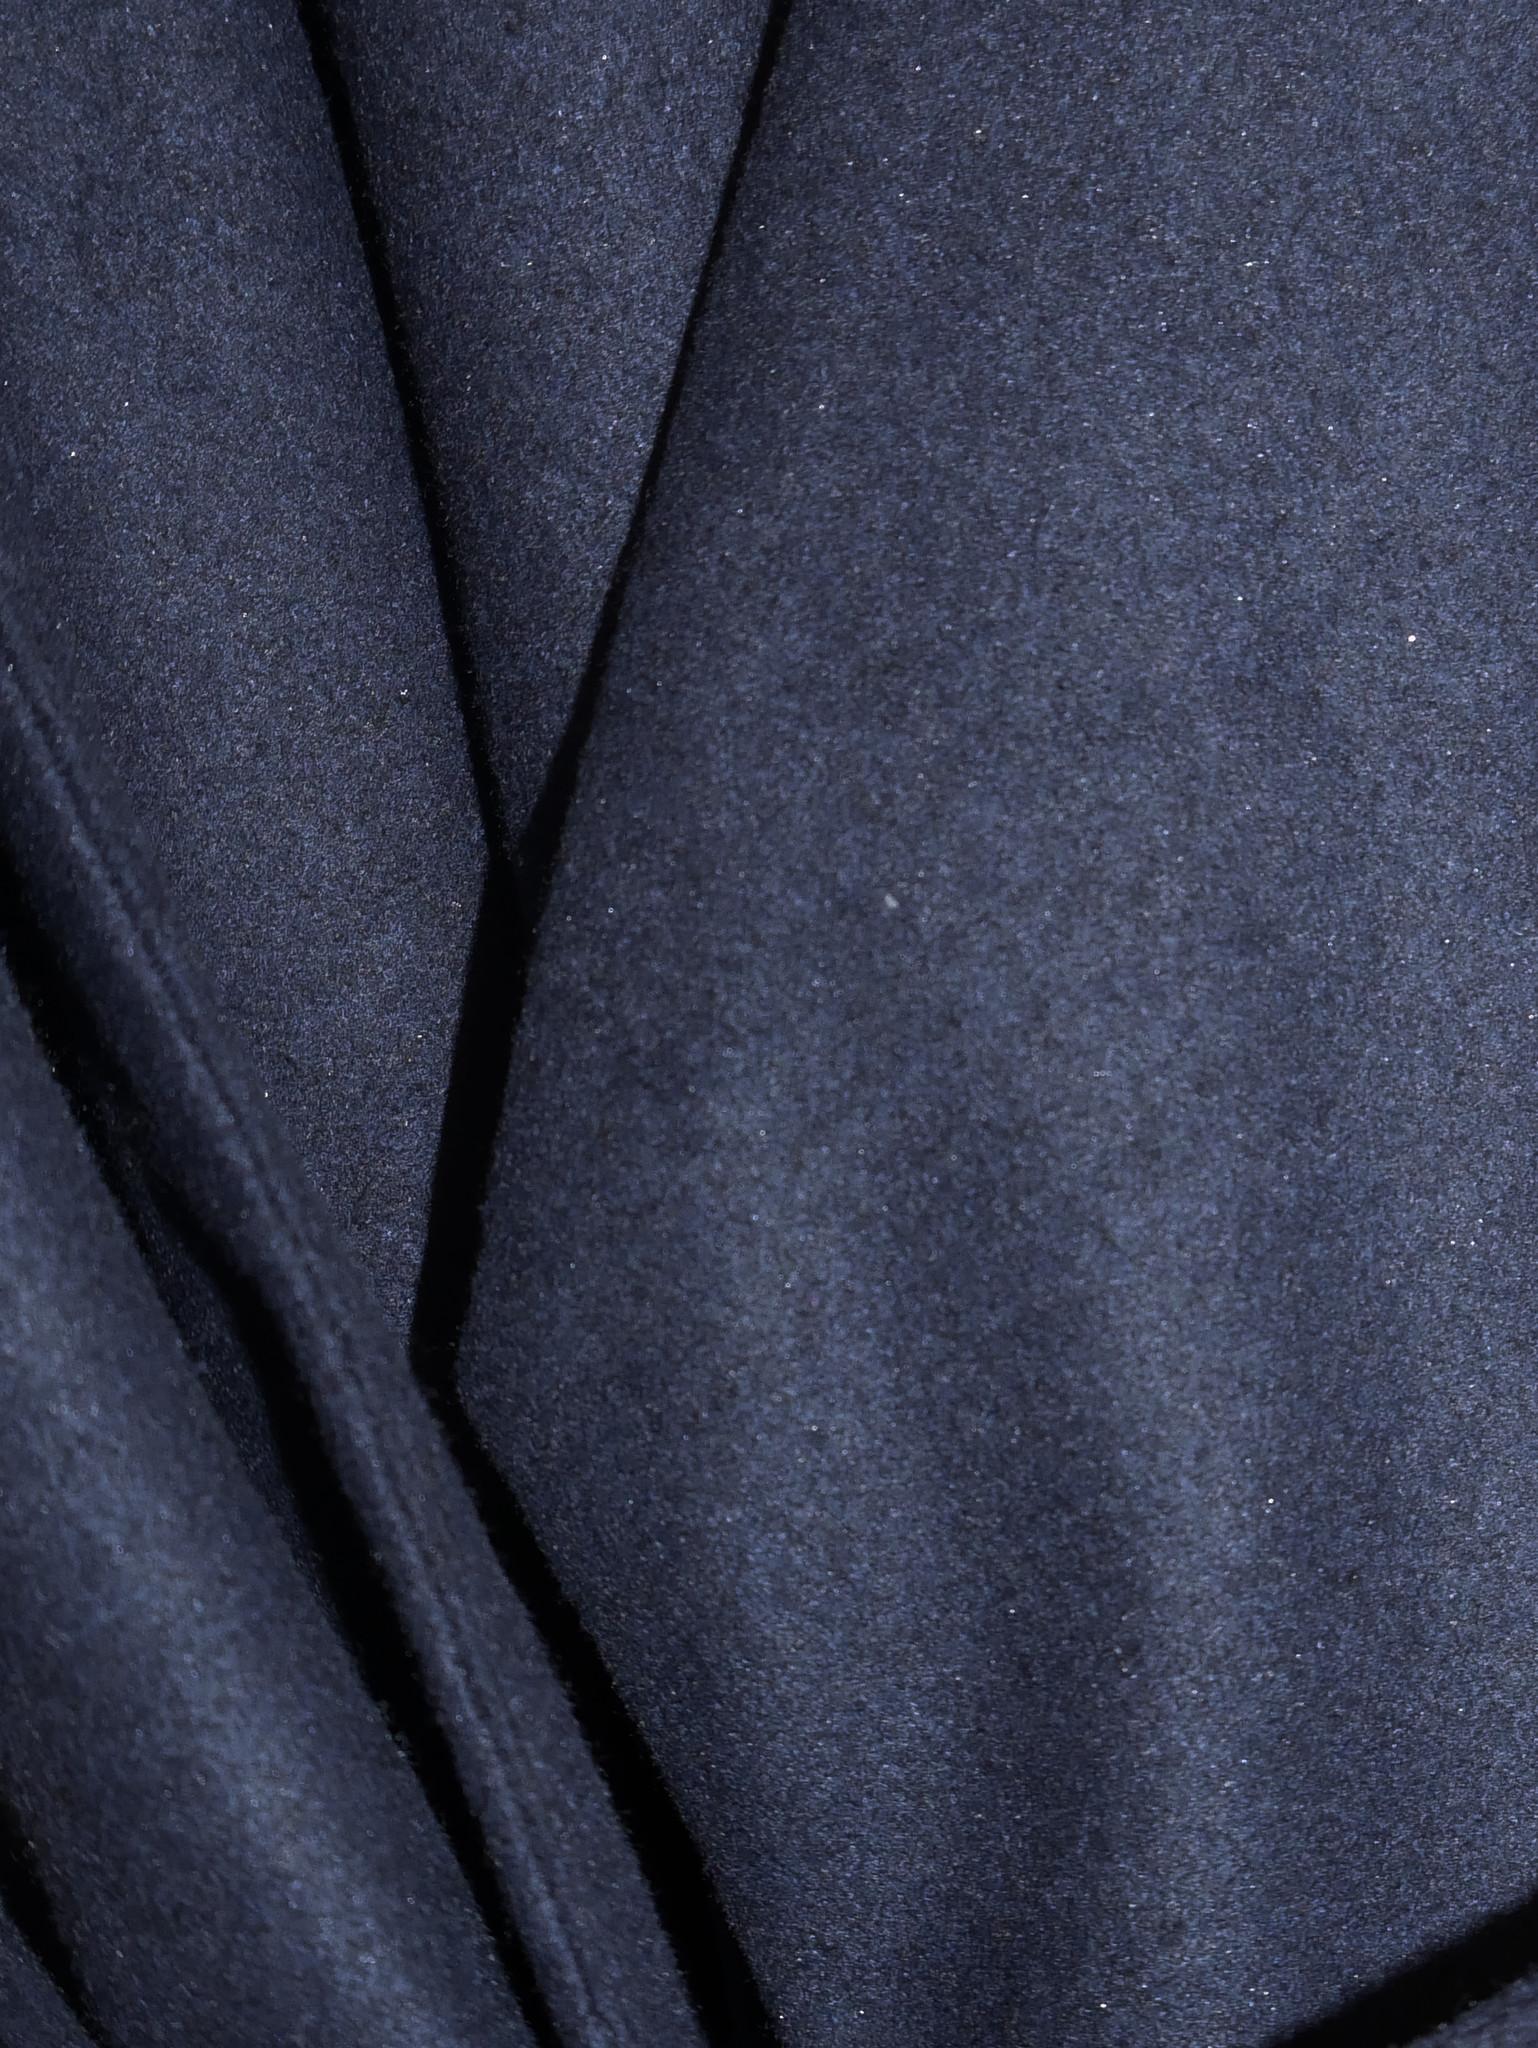 Kimono wool blend jacket - navy-5